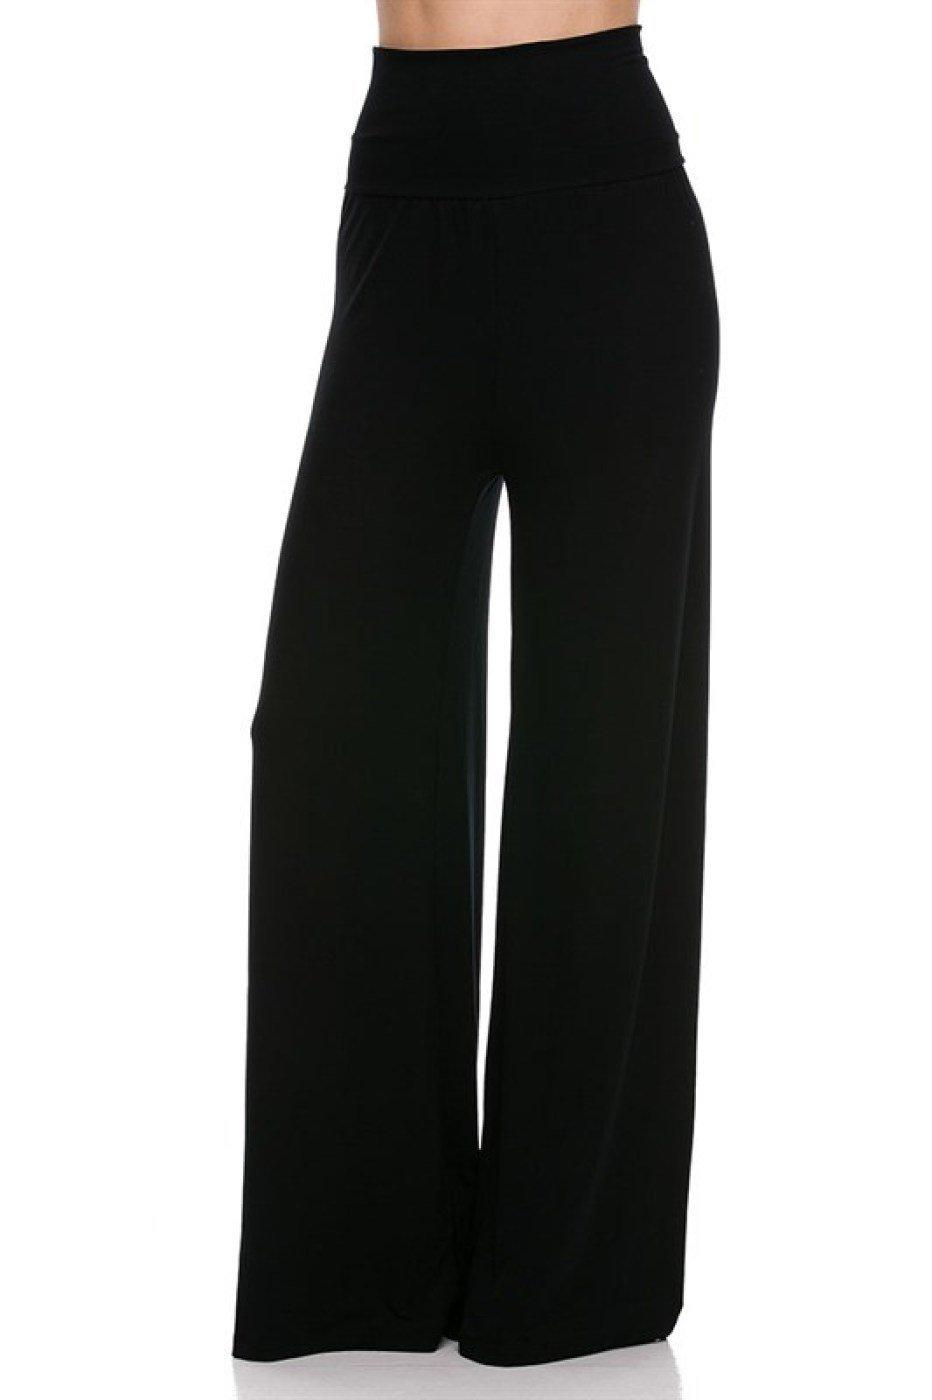 2LUV Plus Women's High Waisted Plus Palazzo Pants Black 3XL (B1098M)